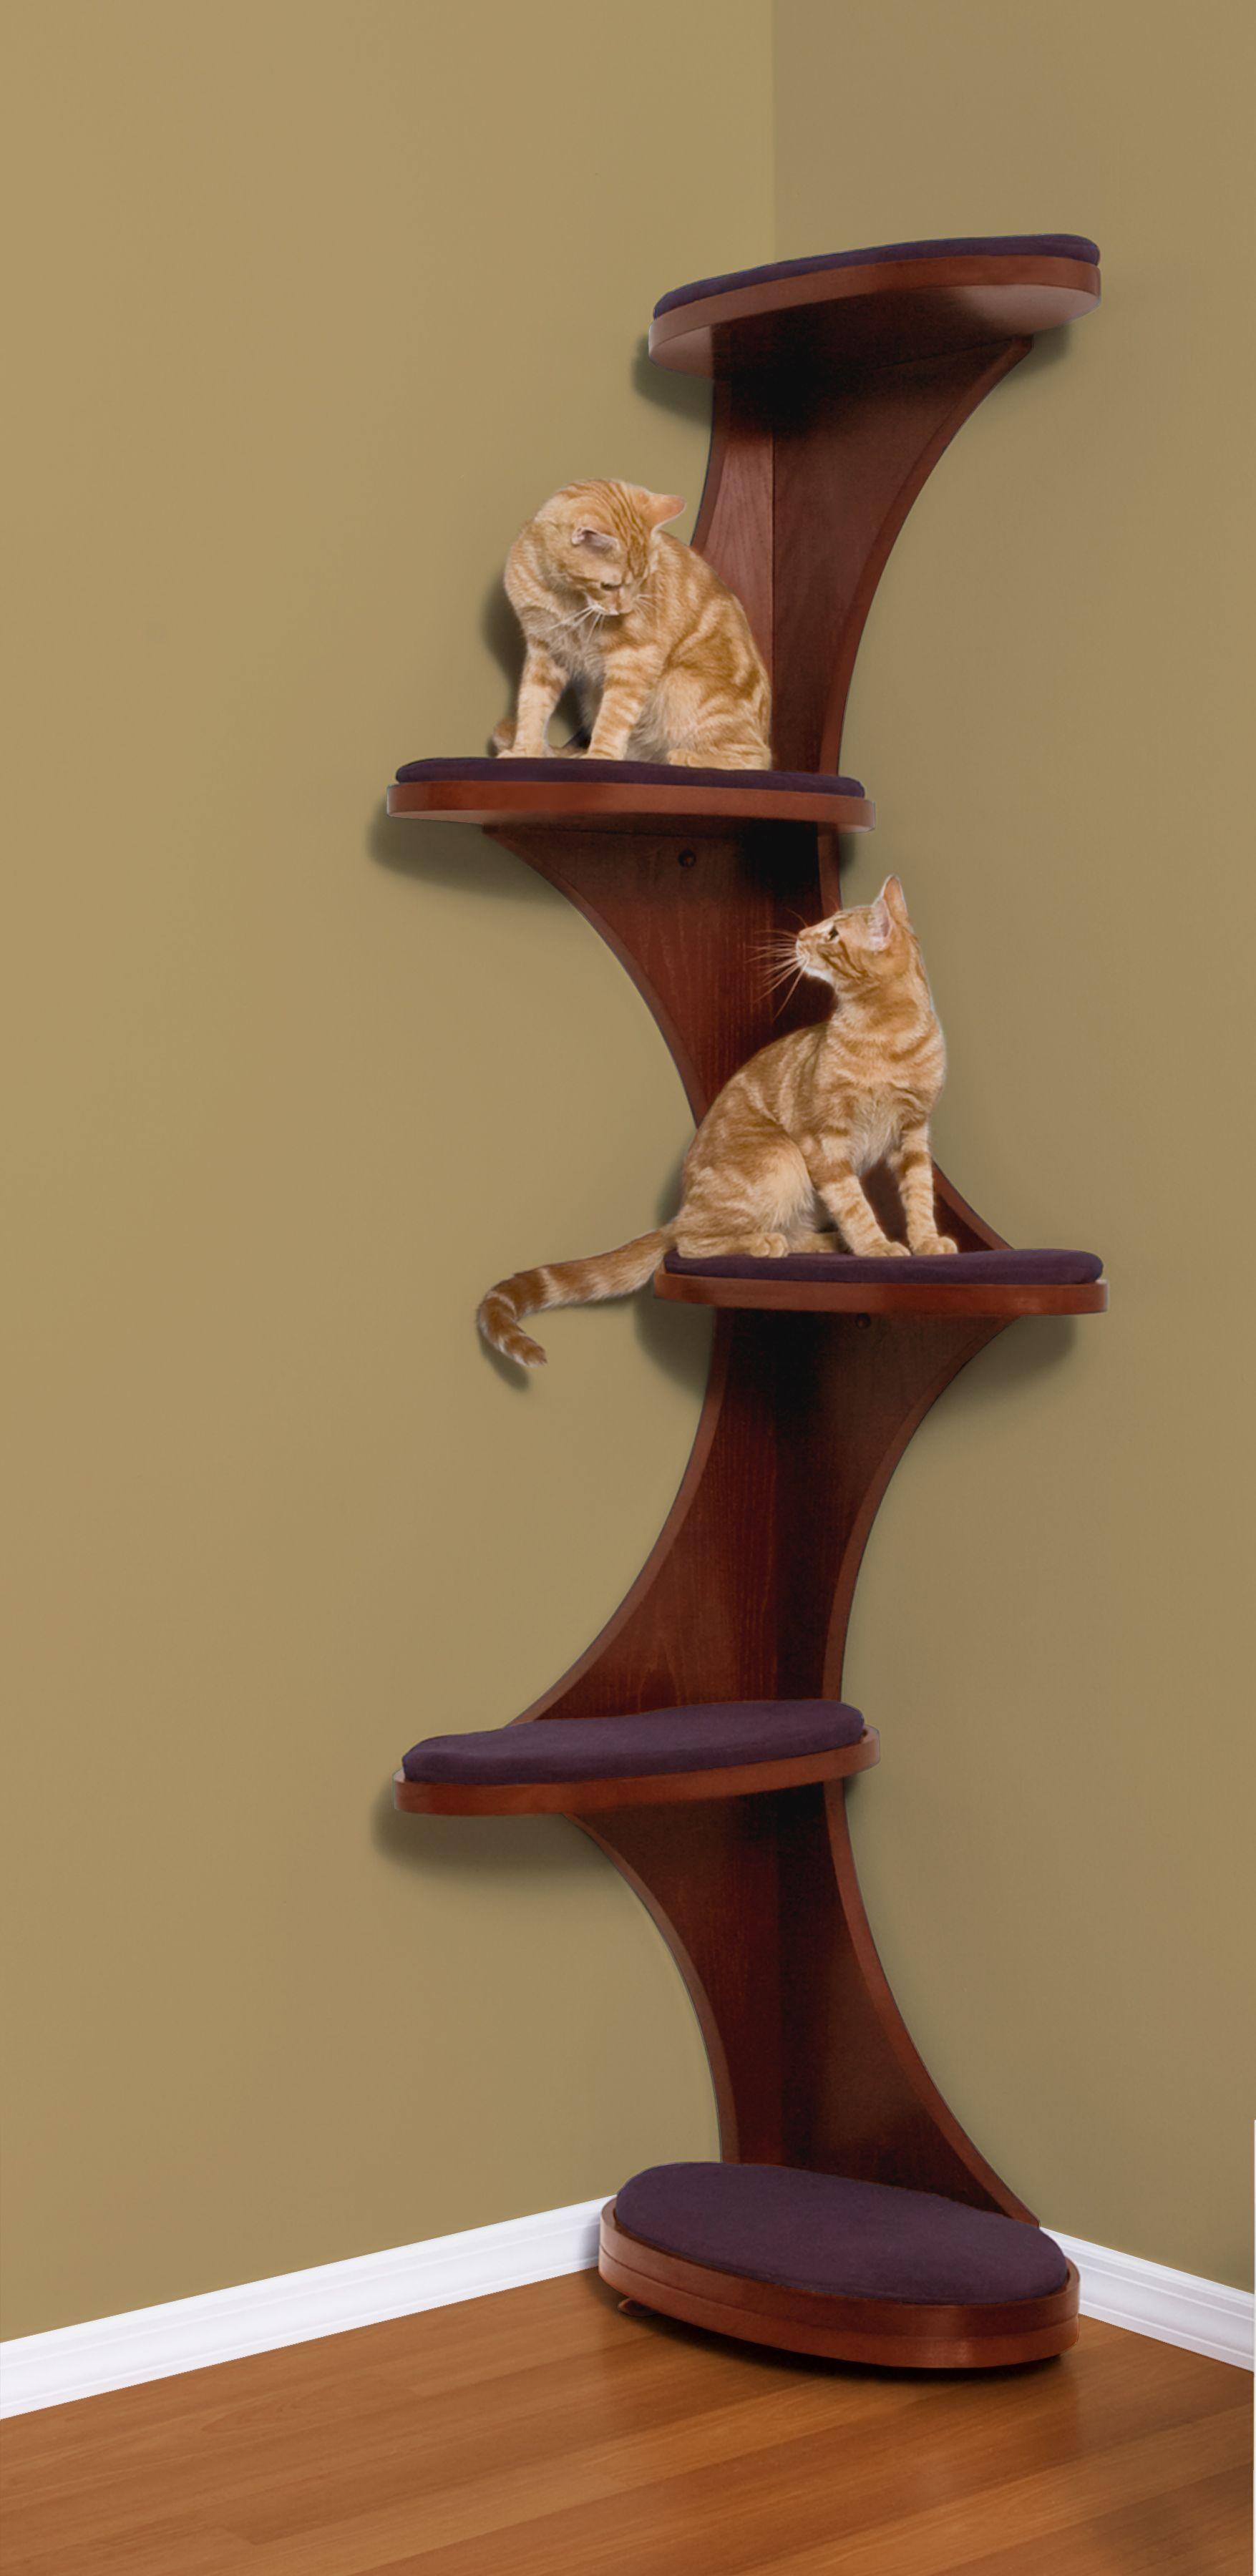 Cat corner cat tree a modern take on cat tower furniture want a cat unique more at catsincare com